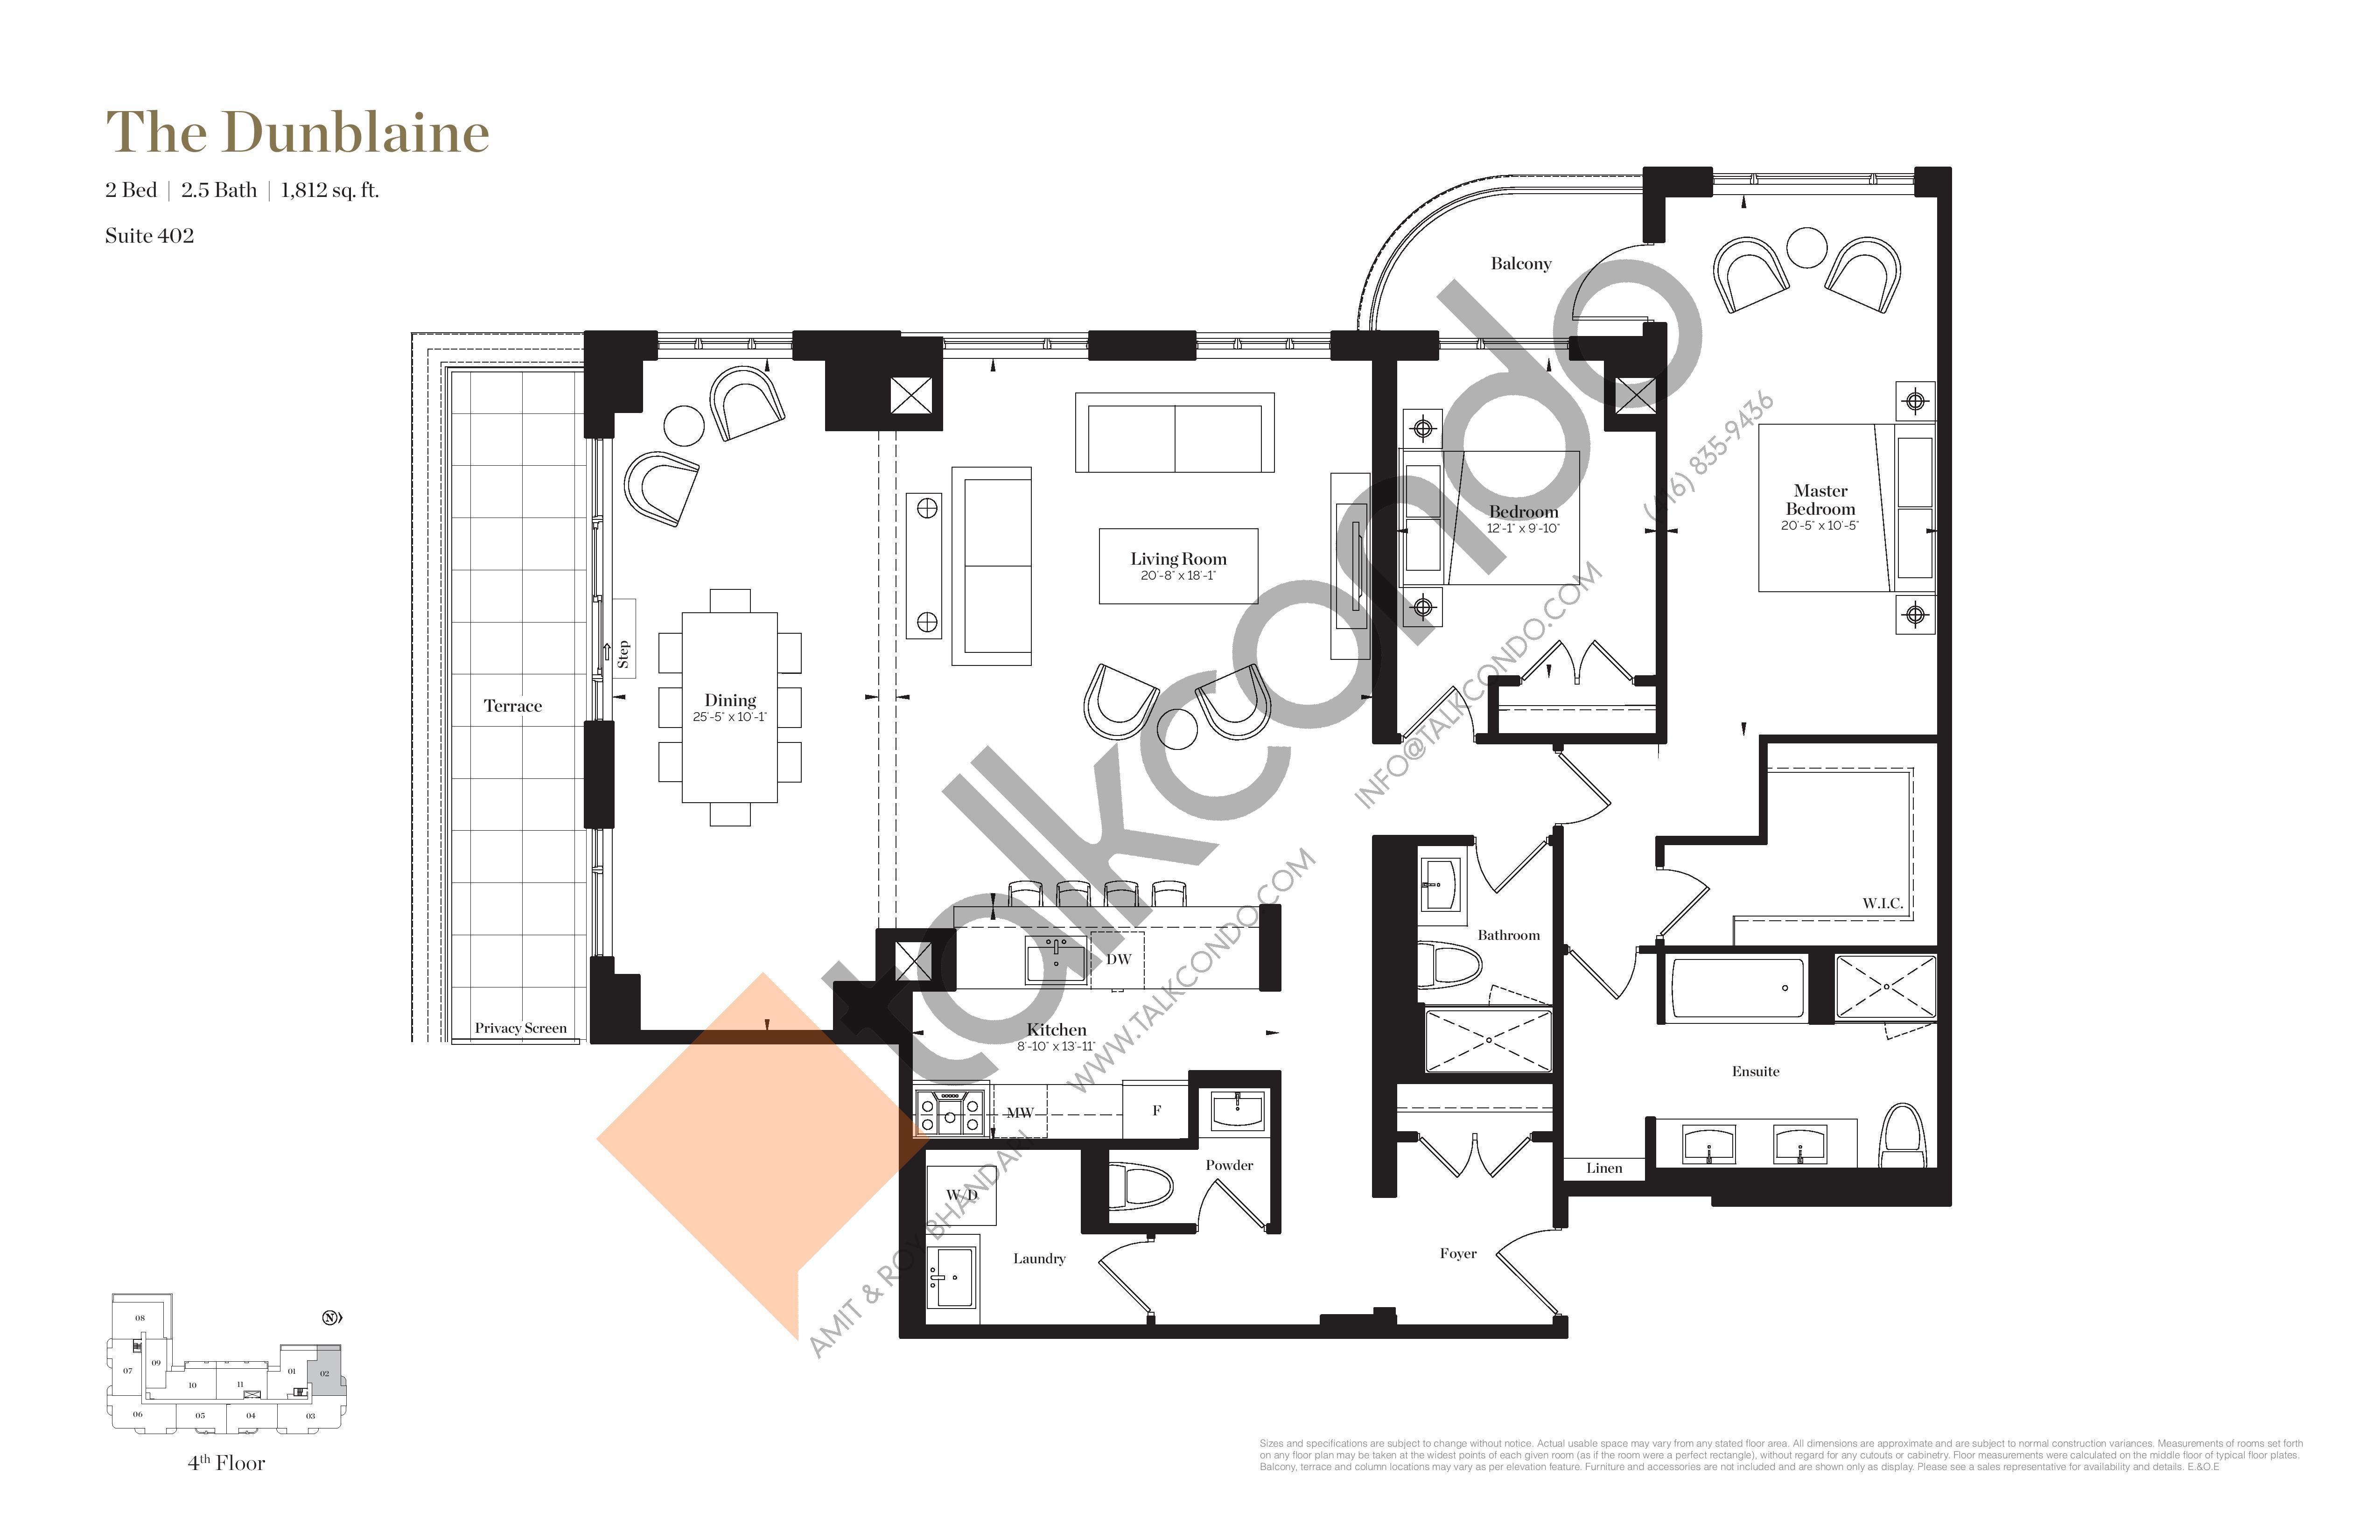 The Dunblaine Floor Plan at Empire Maven Condos - 1812 sq.ft